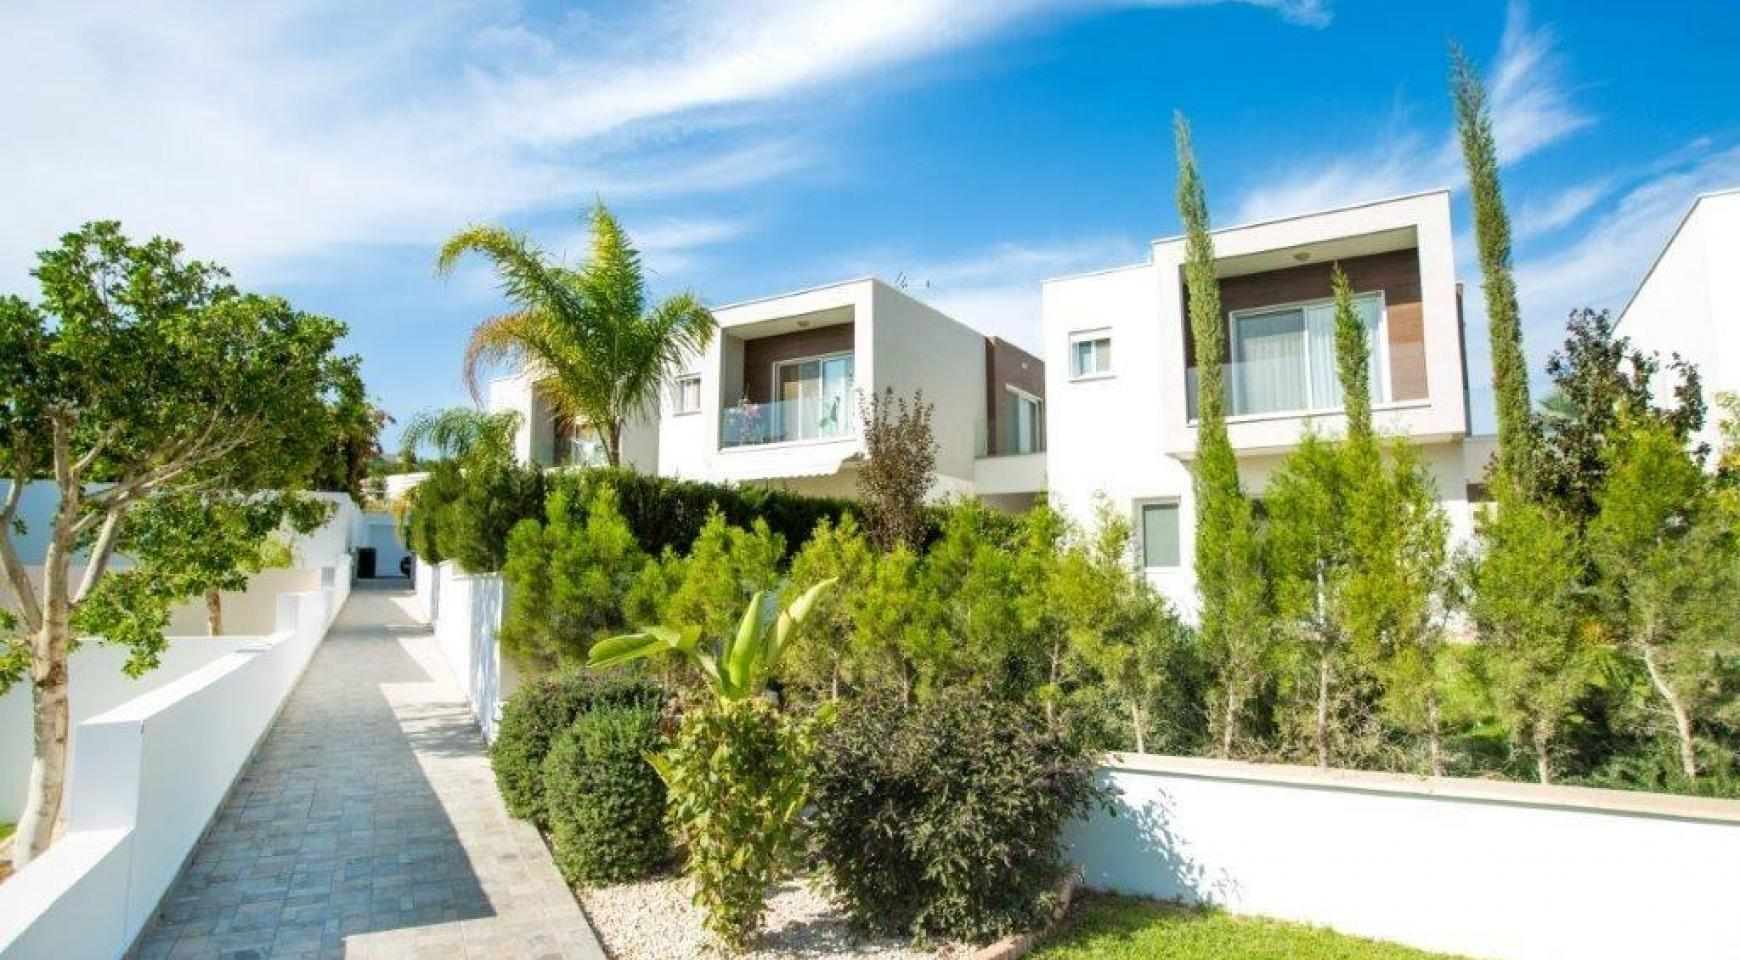 3 Bedroom Villa in Ipsonas Area - 6